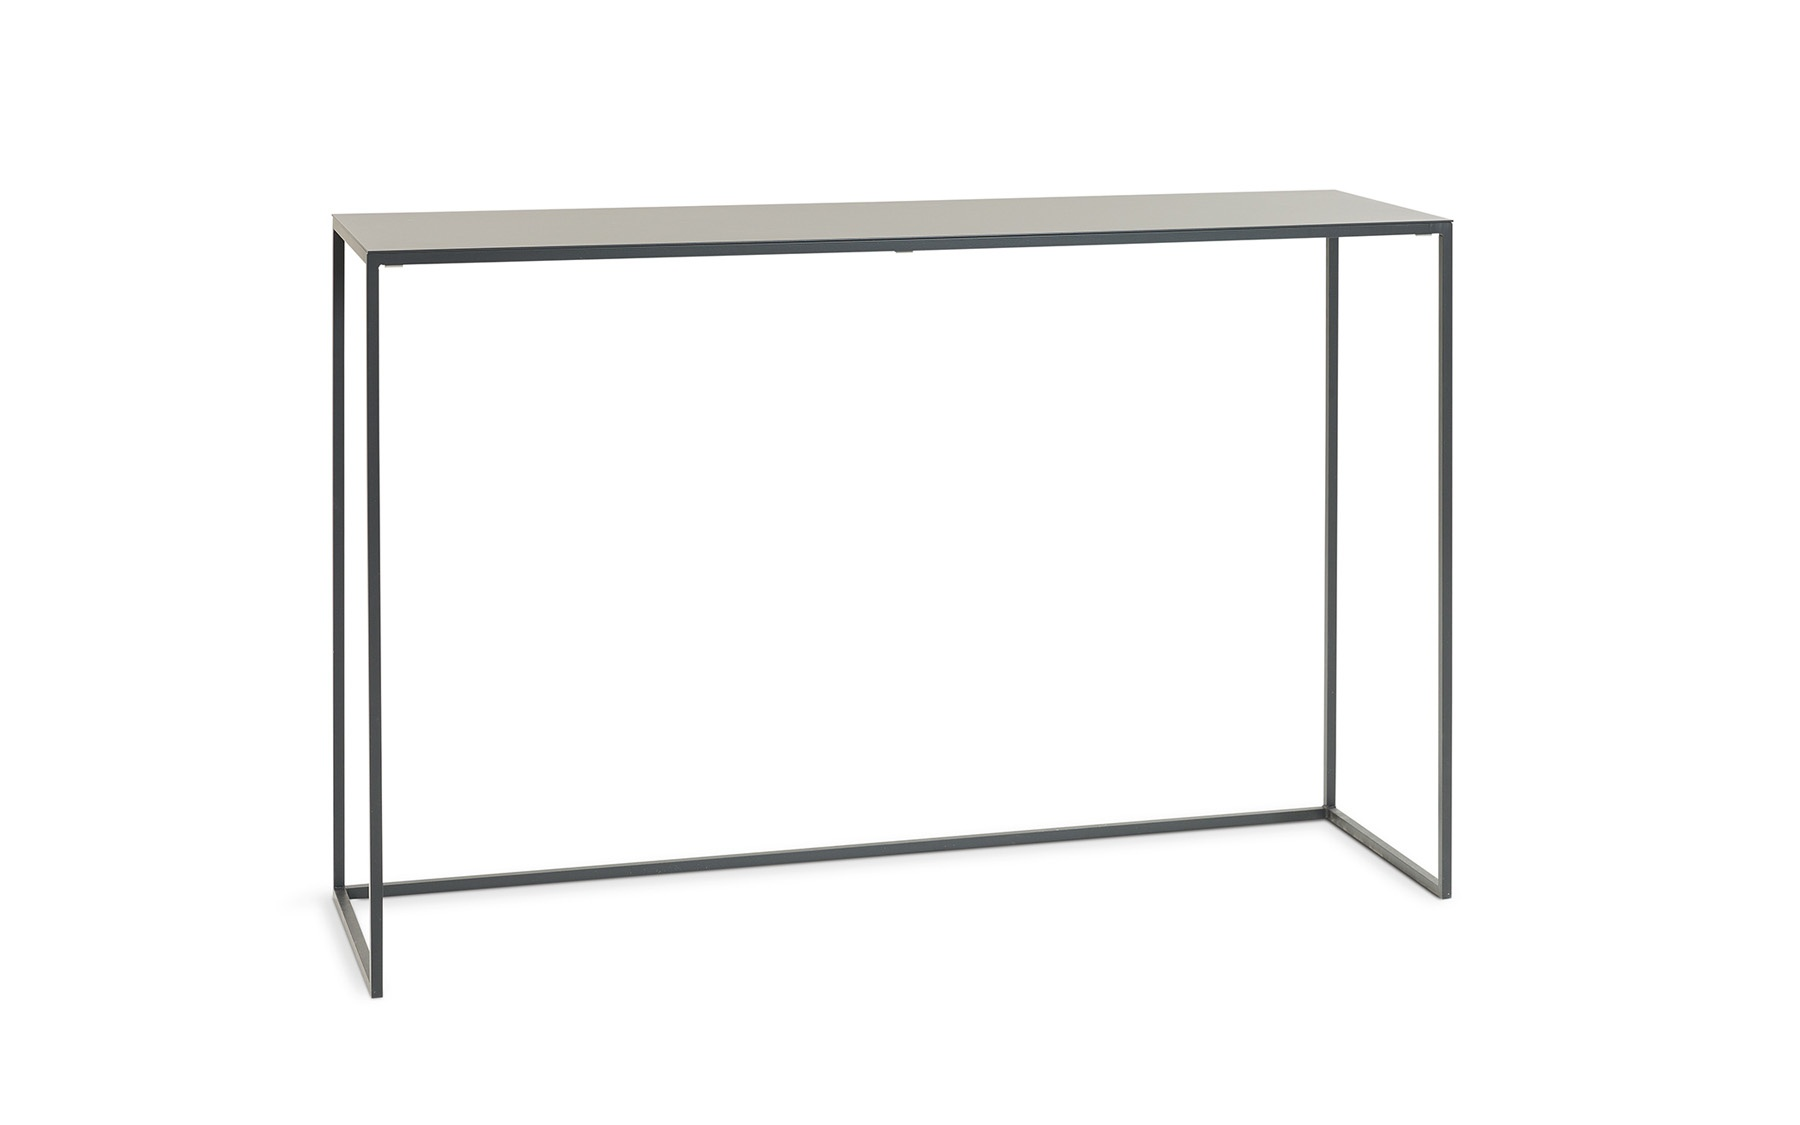 Table console 47x14x30 d283 tables d 39 appoint for Galerie du meuble